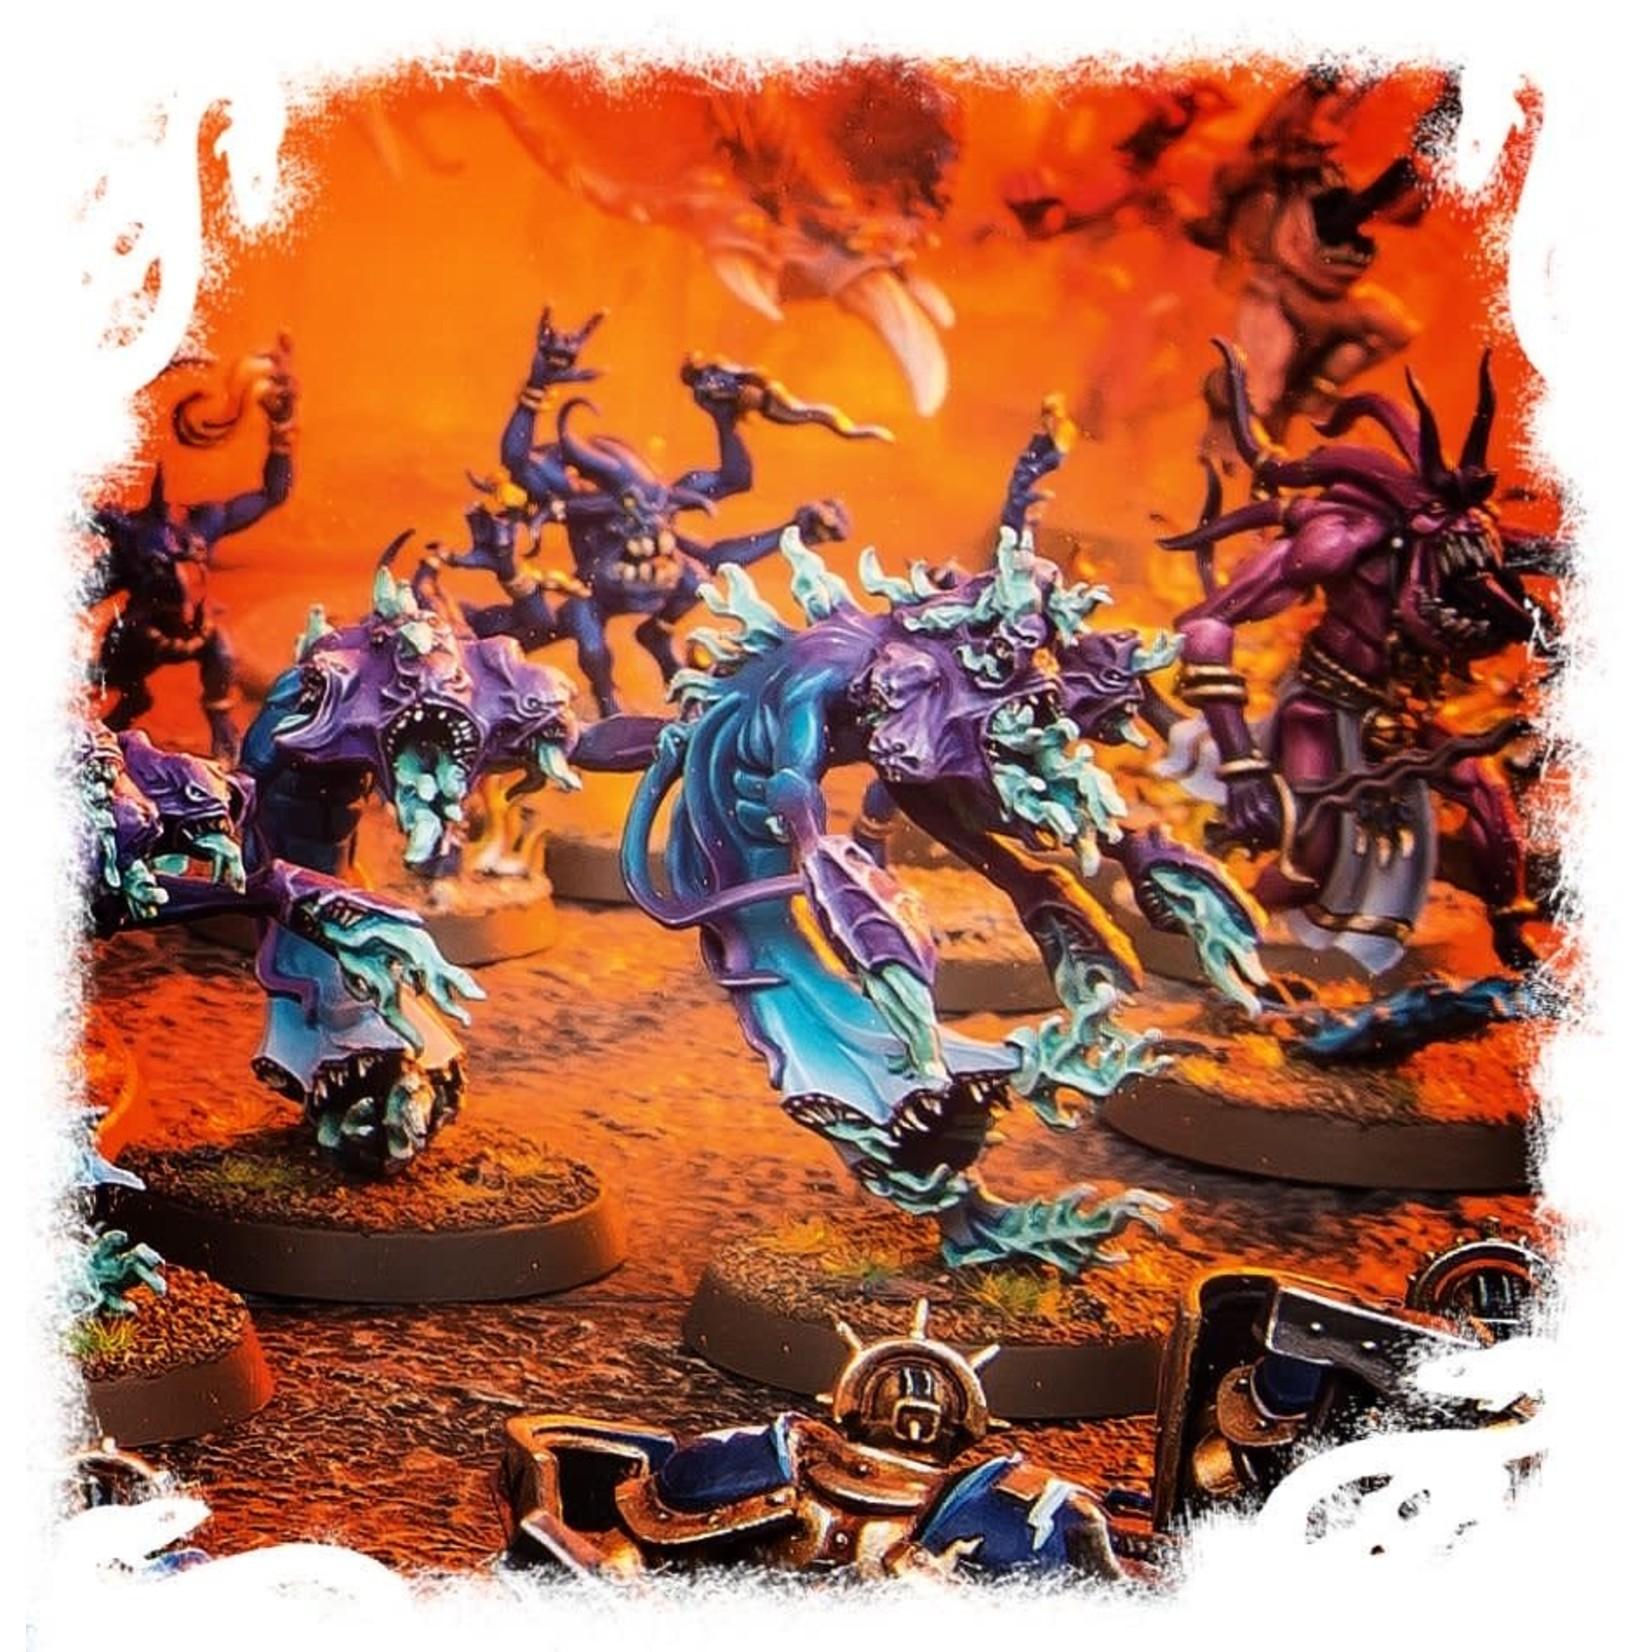 Games Workshop Warhammer Age of Sigmar: Daemons of Tzeentch Flamers of Tzeentch